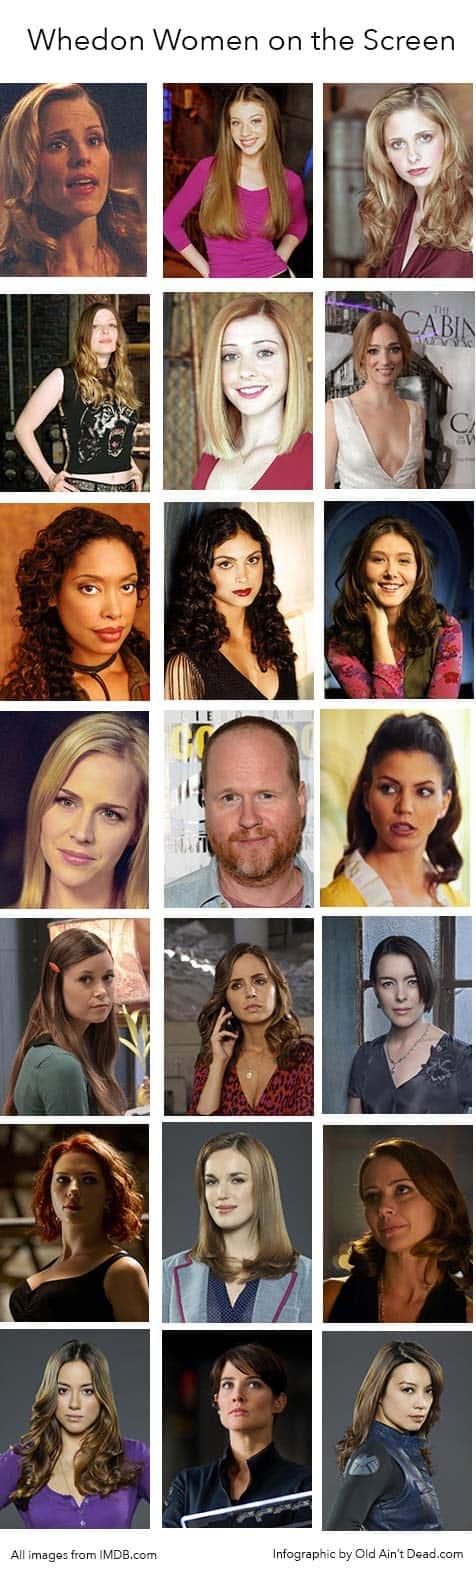 Whedon Women